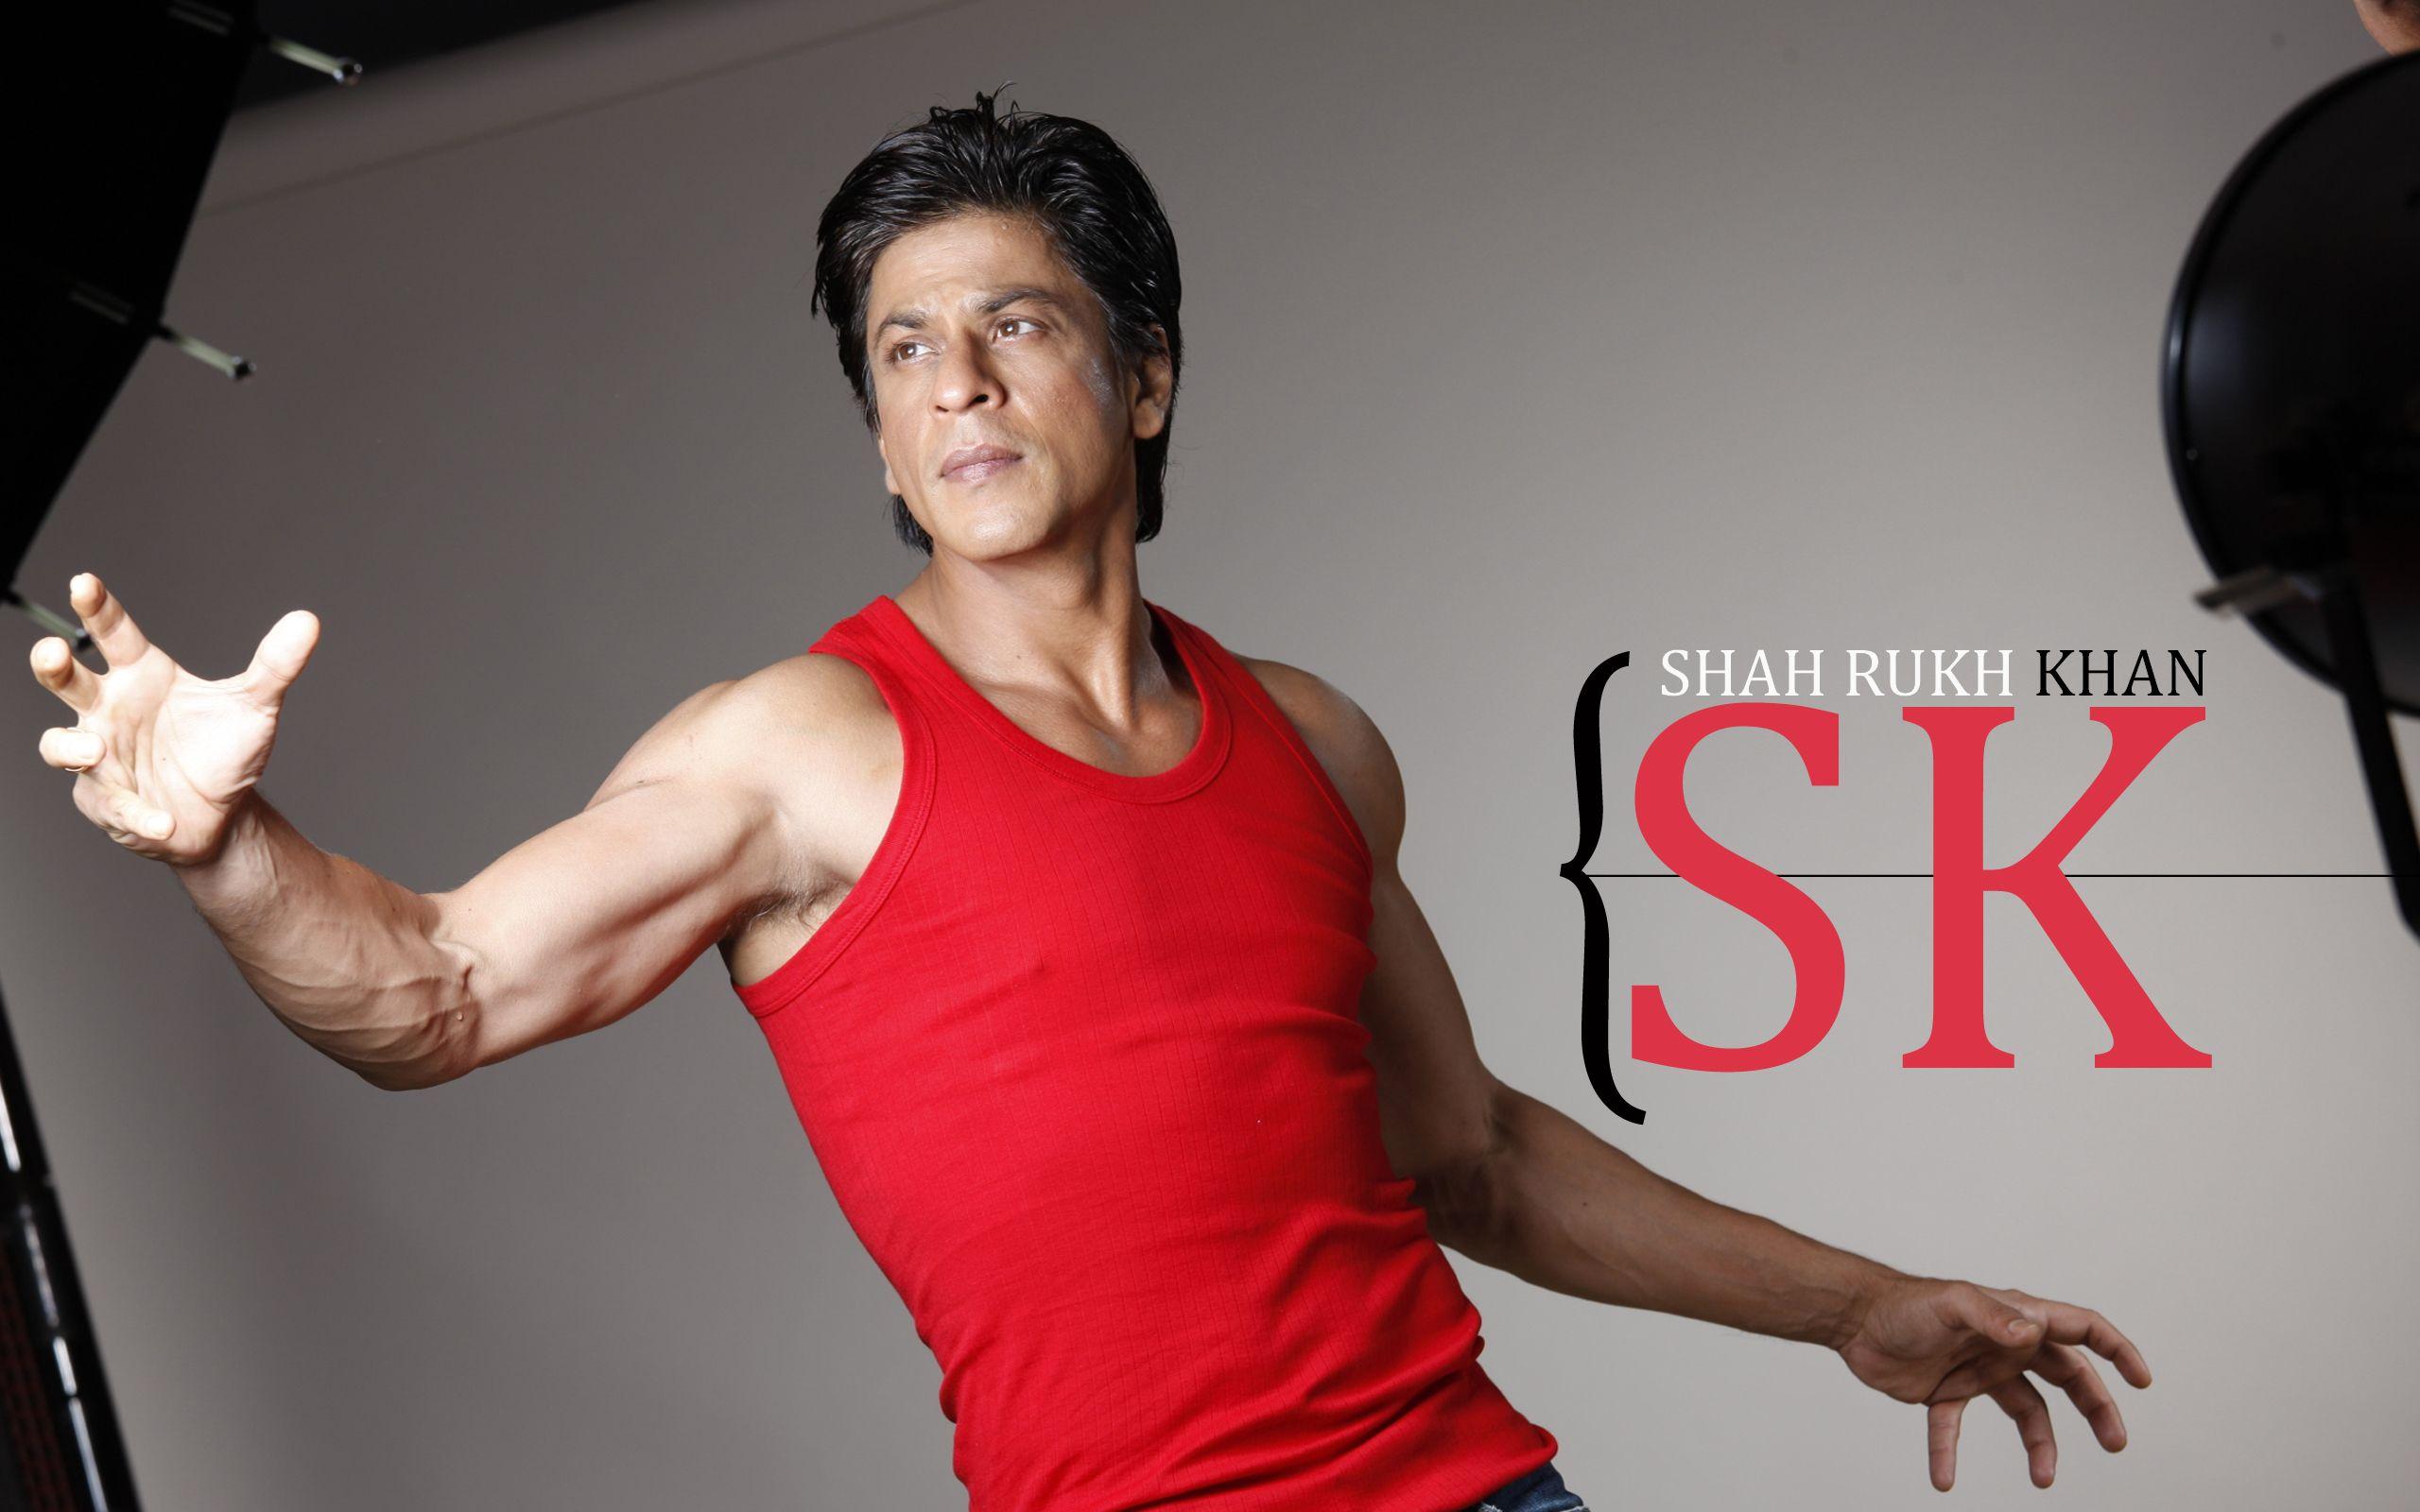 srk bollywood actor hd wallpaper shahrukh khan, bollywood actor, hd